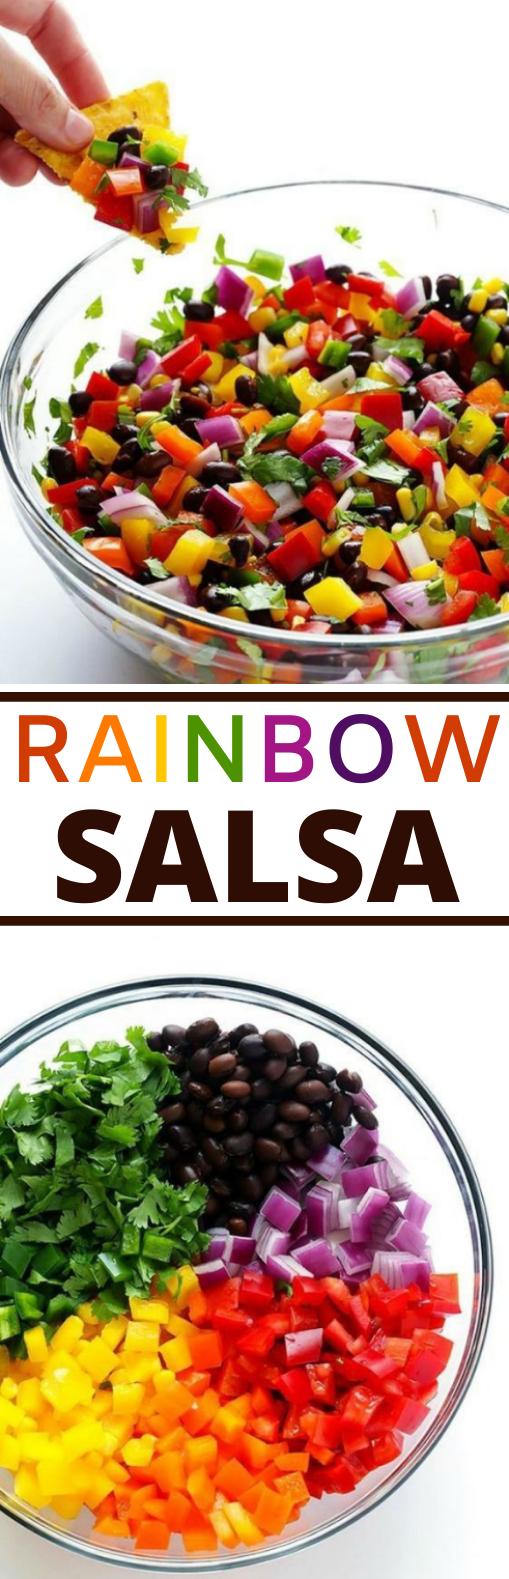 Rainbow Salsa #vegan #healthy #glutenfree #paleo #sidedish